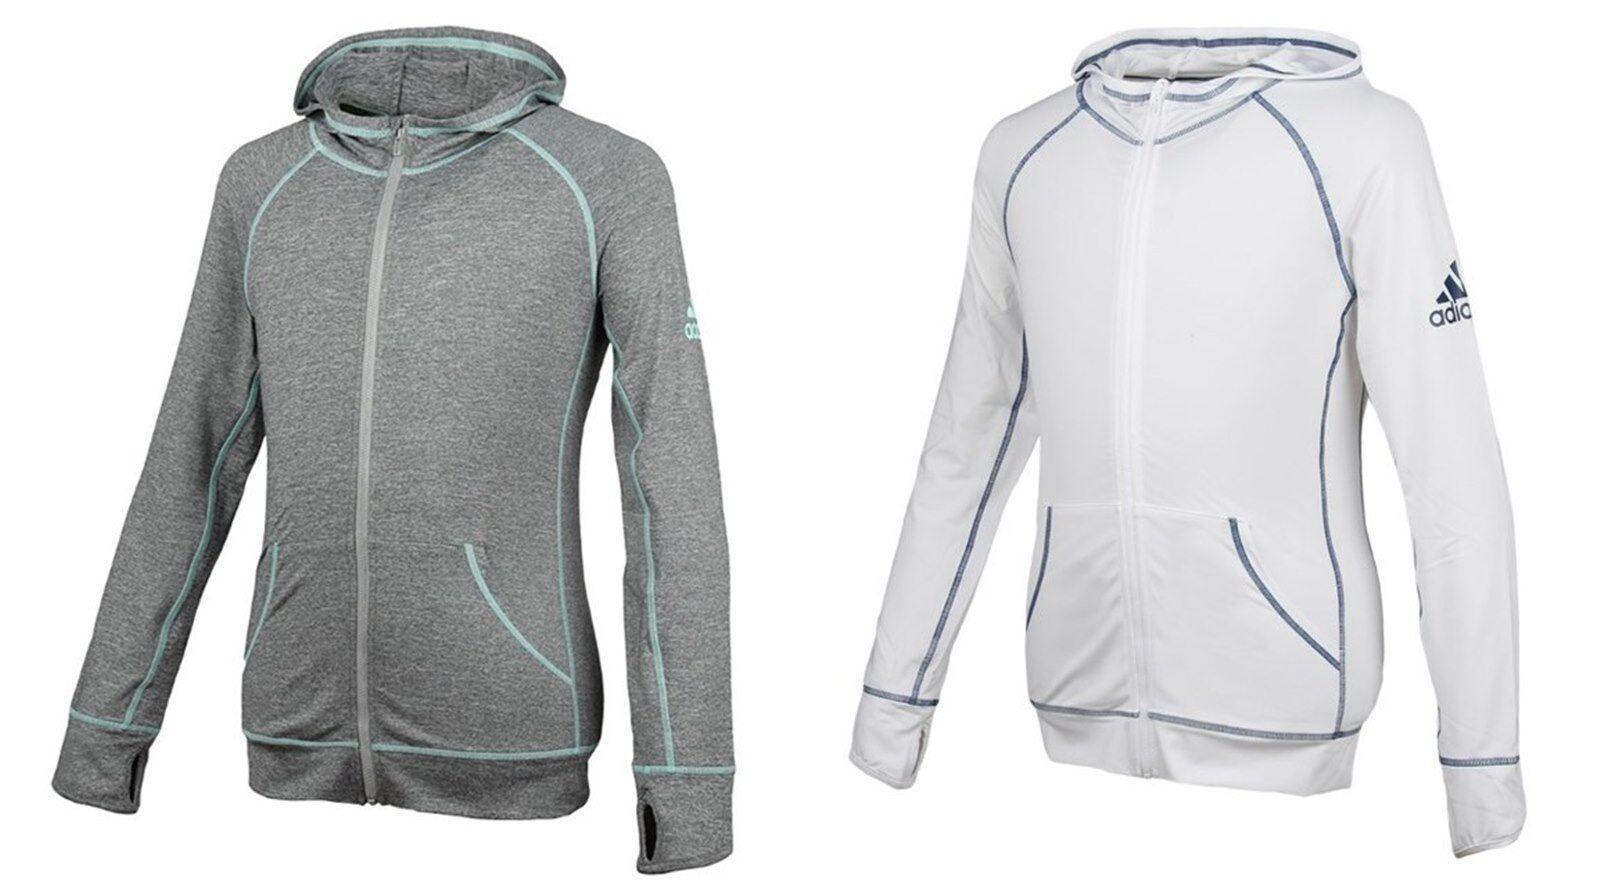 Adidas damen Rashguard Hoodie L S Jackets Weiß Training Swim Yoga Jersey BK5631